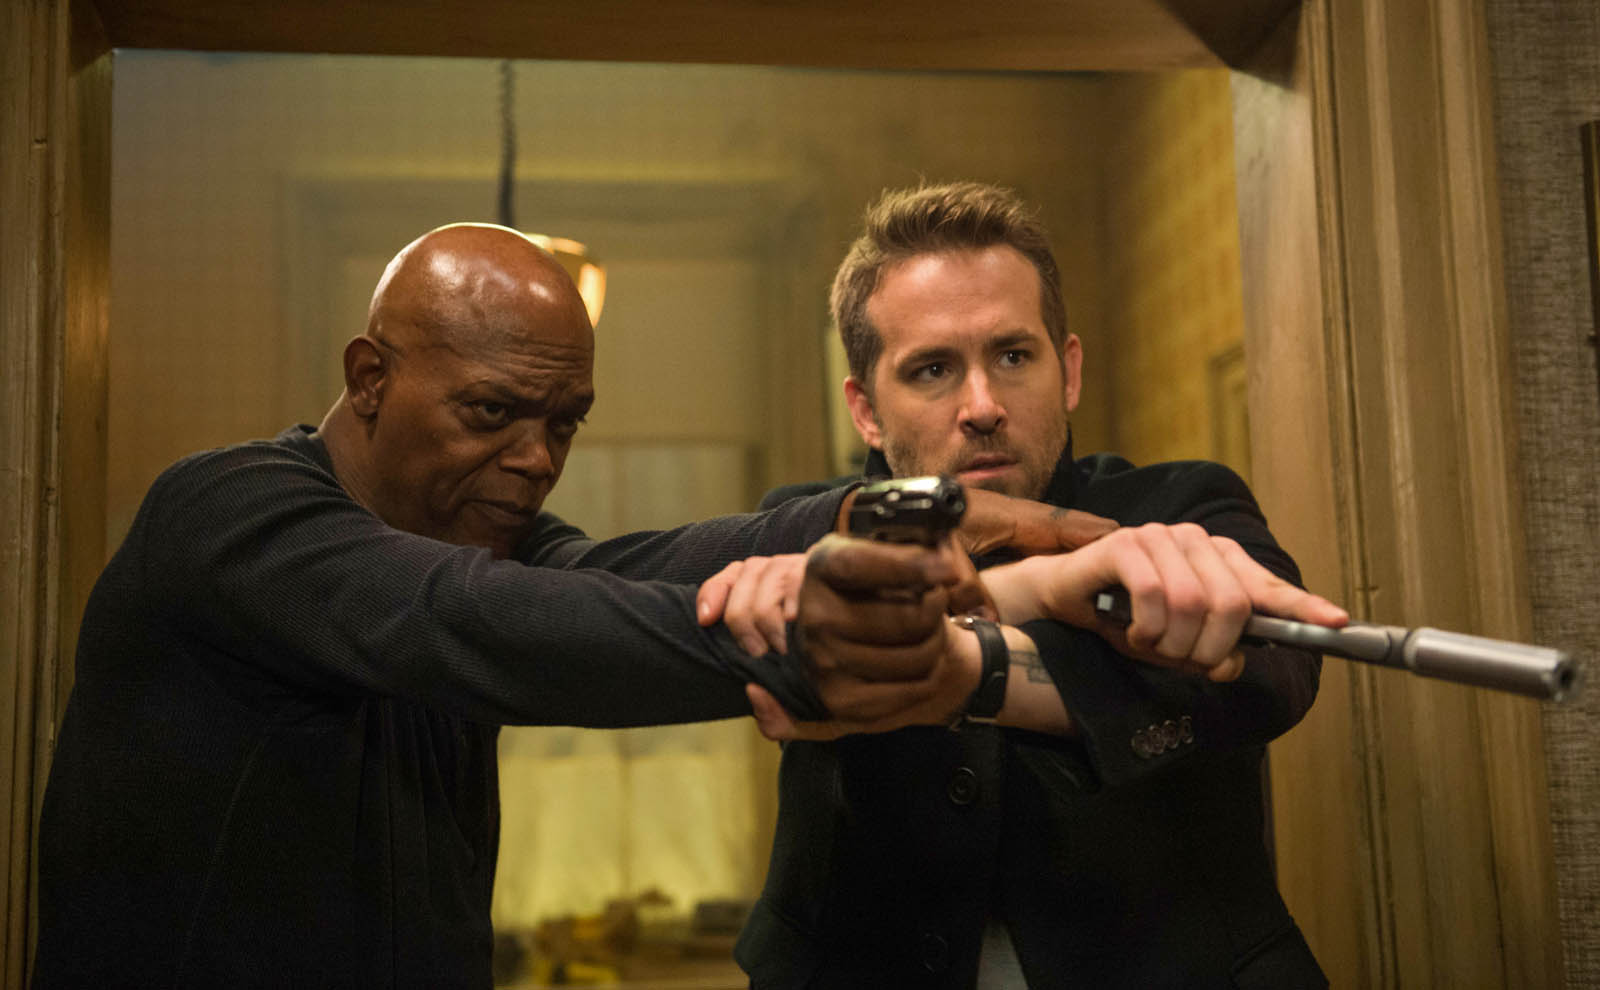 Sneak Review #86 – Killer's Bodyguard